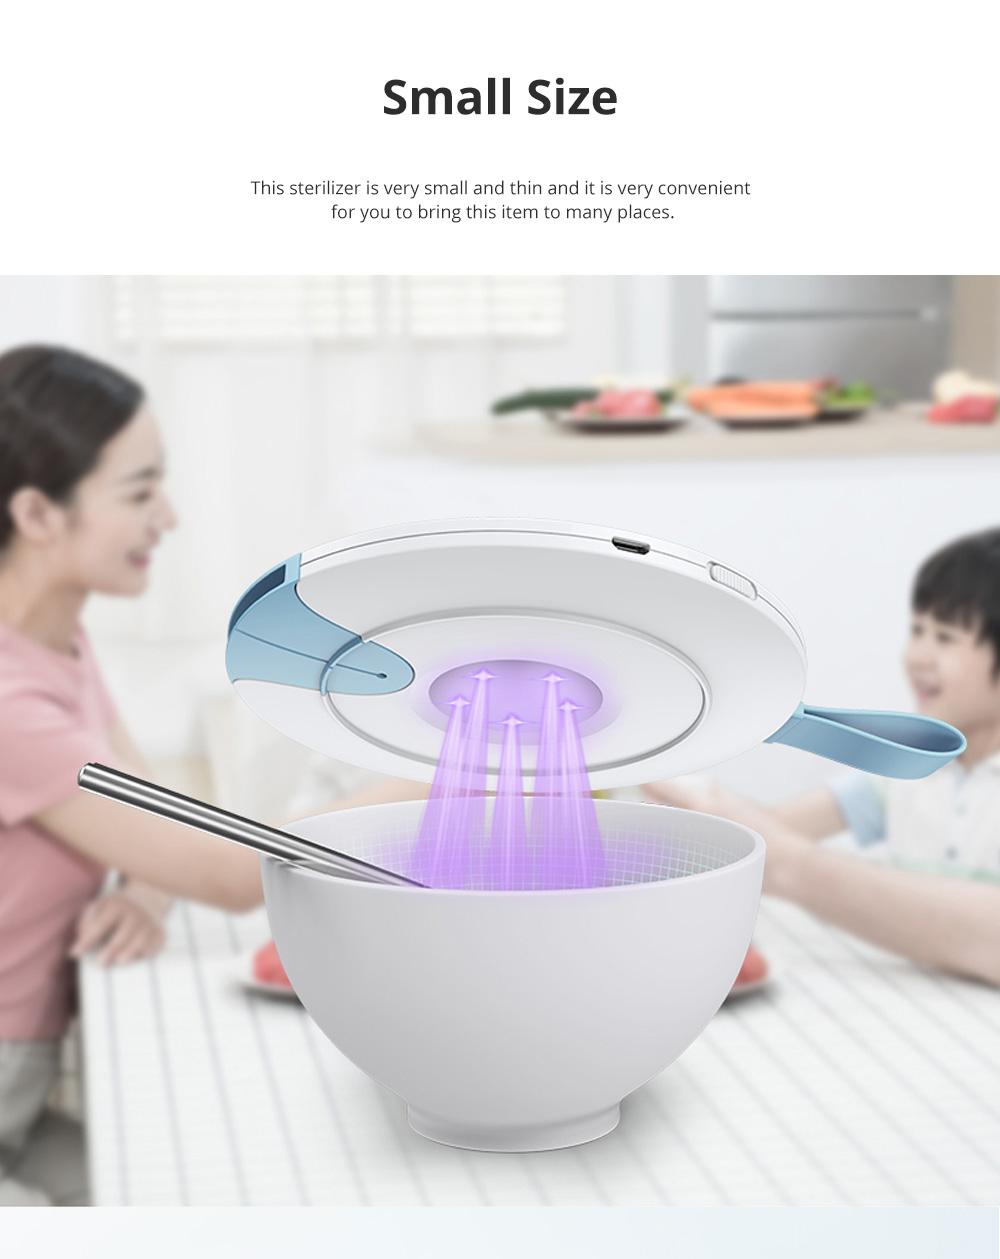 Portable Professional Quick Ultraviolet Ray Disinfectant Machine Bowls Chopsticks Phone Sterilizer 6